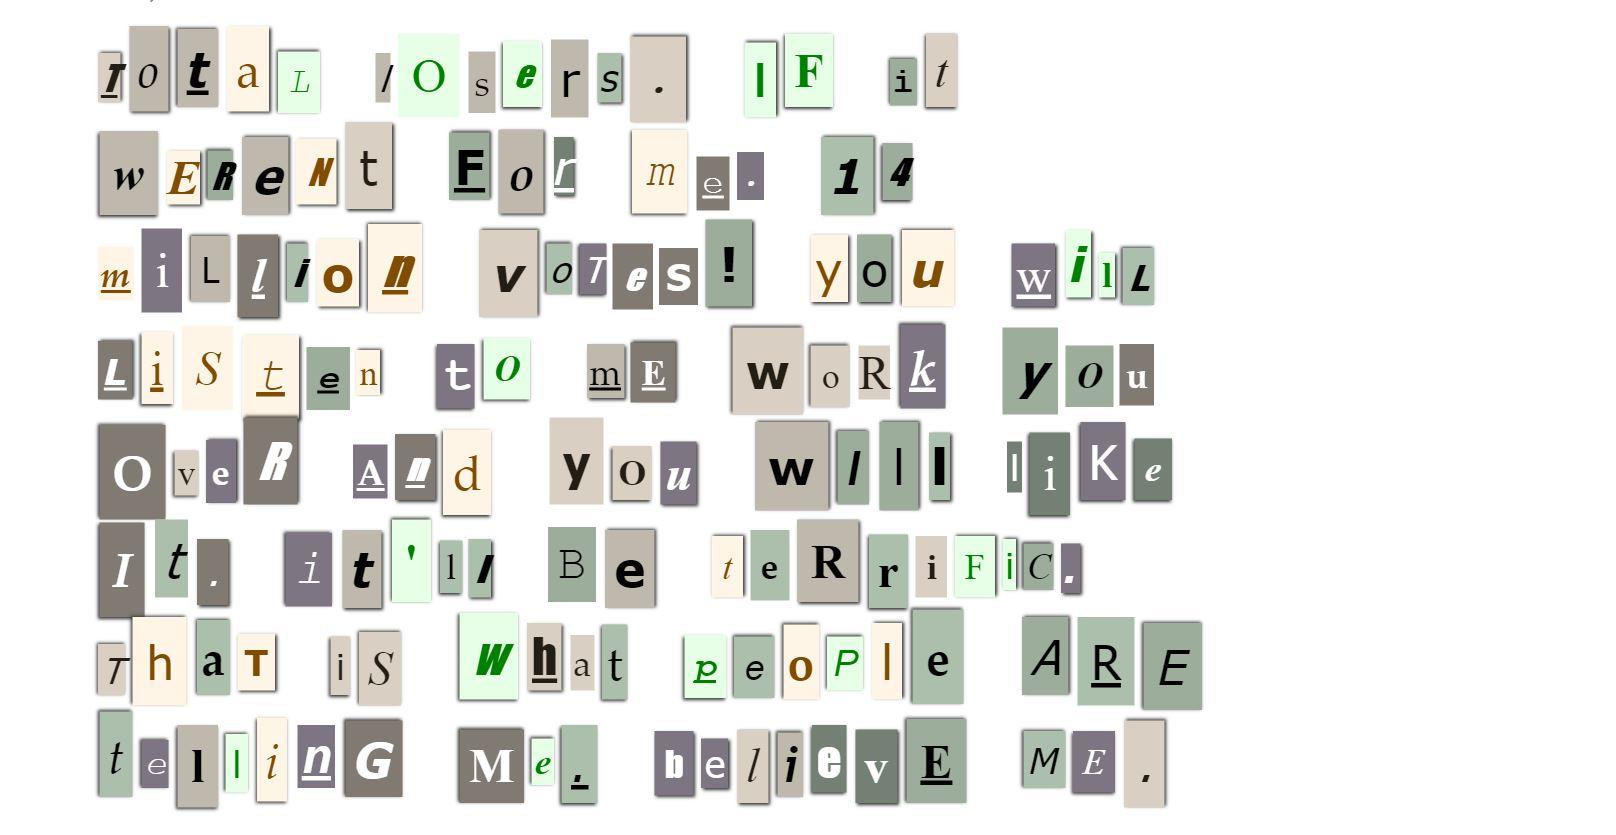 Ransom note generator boing boing ransom note generator spiritdancerdesigns Choice Image